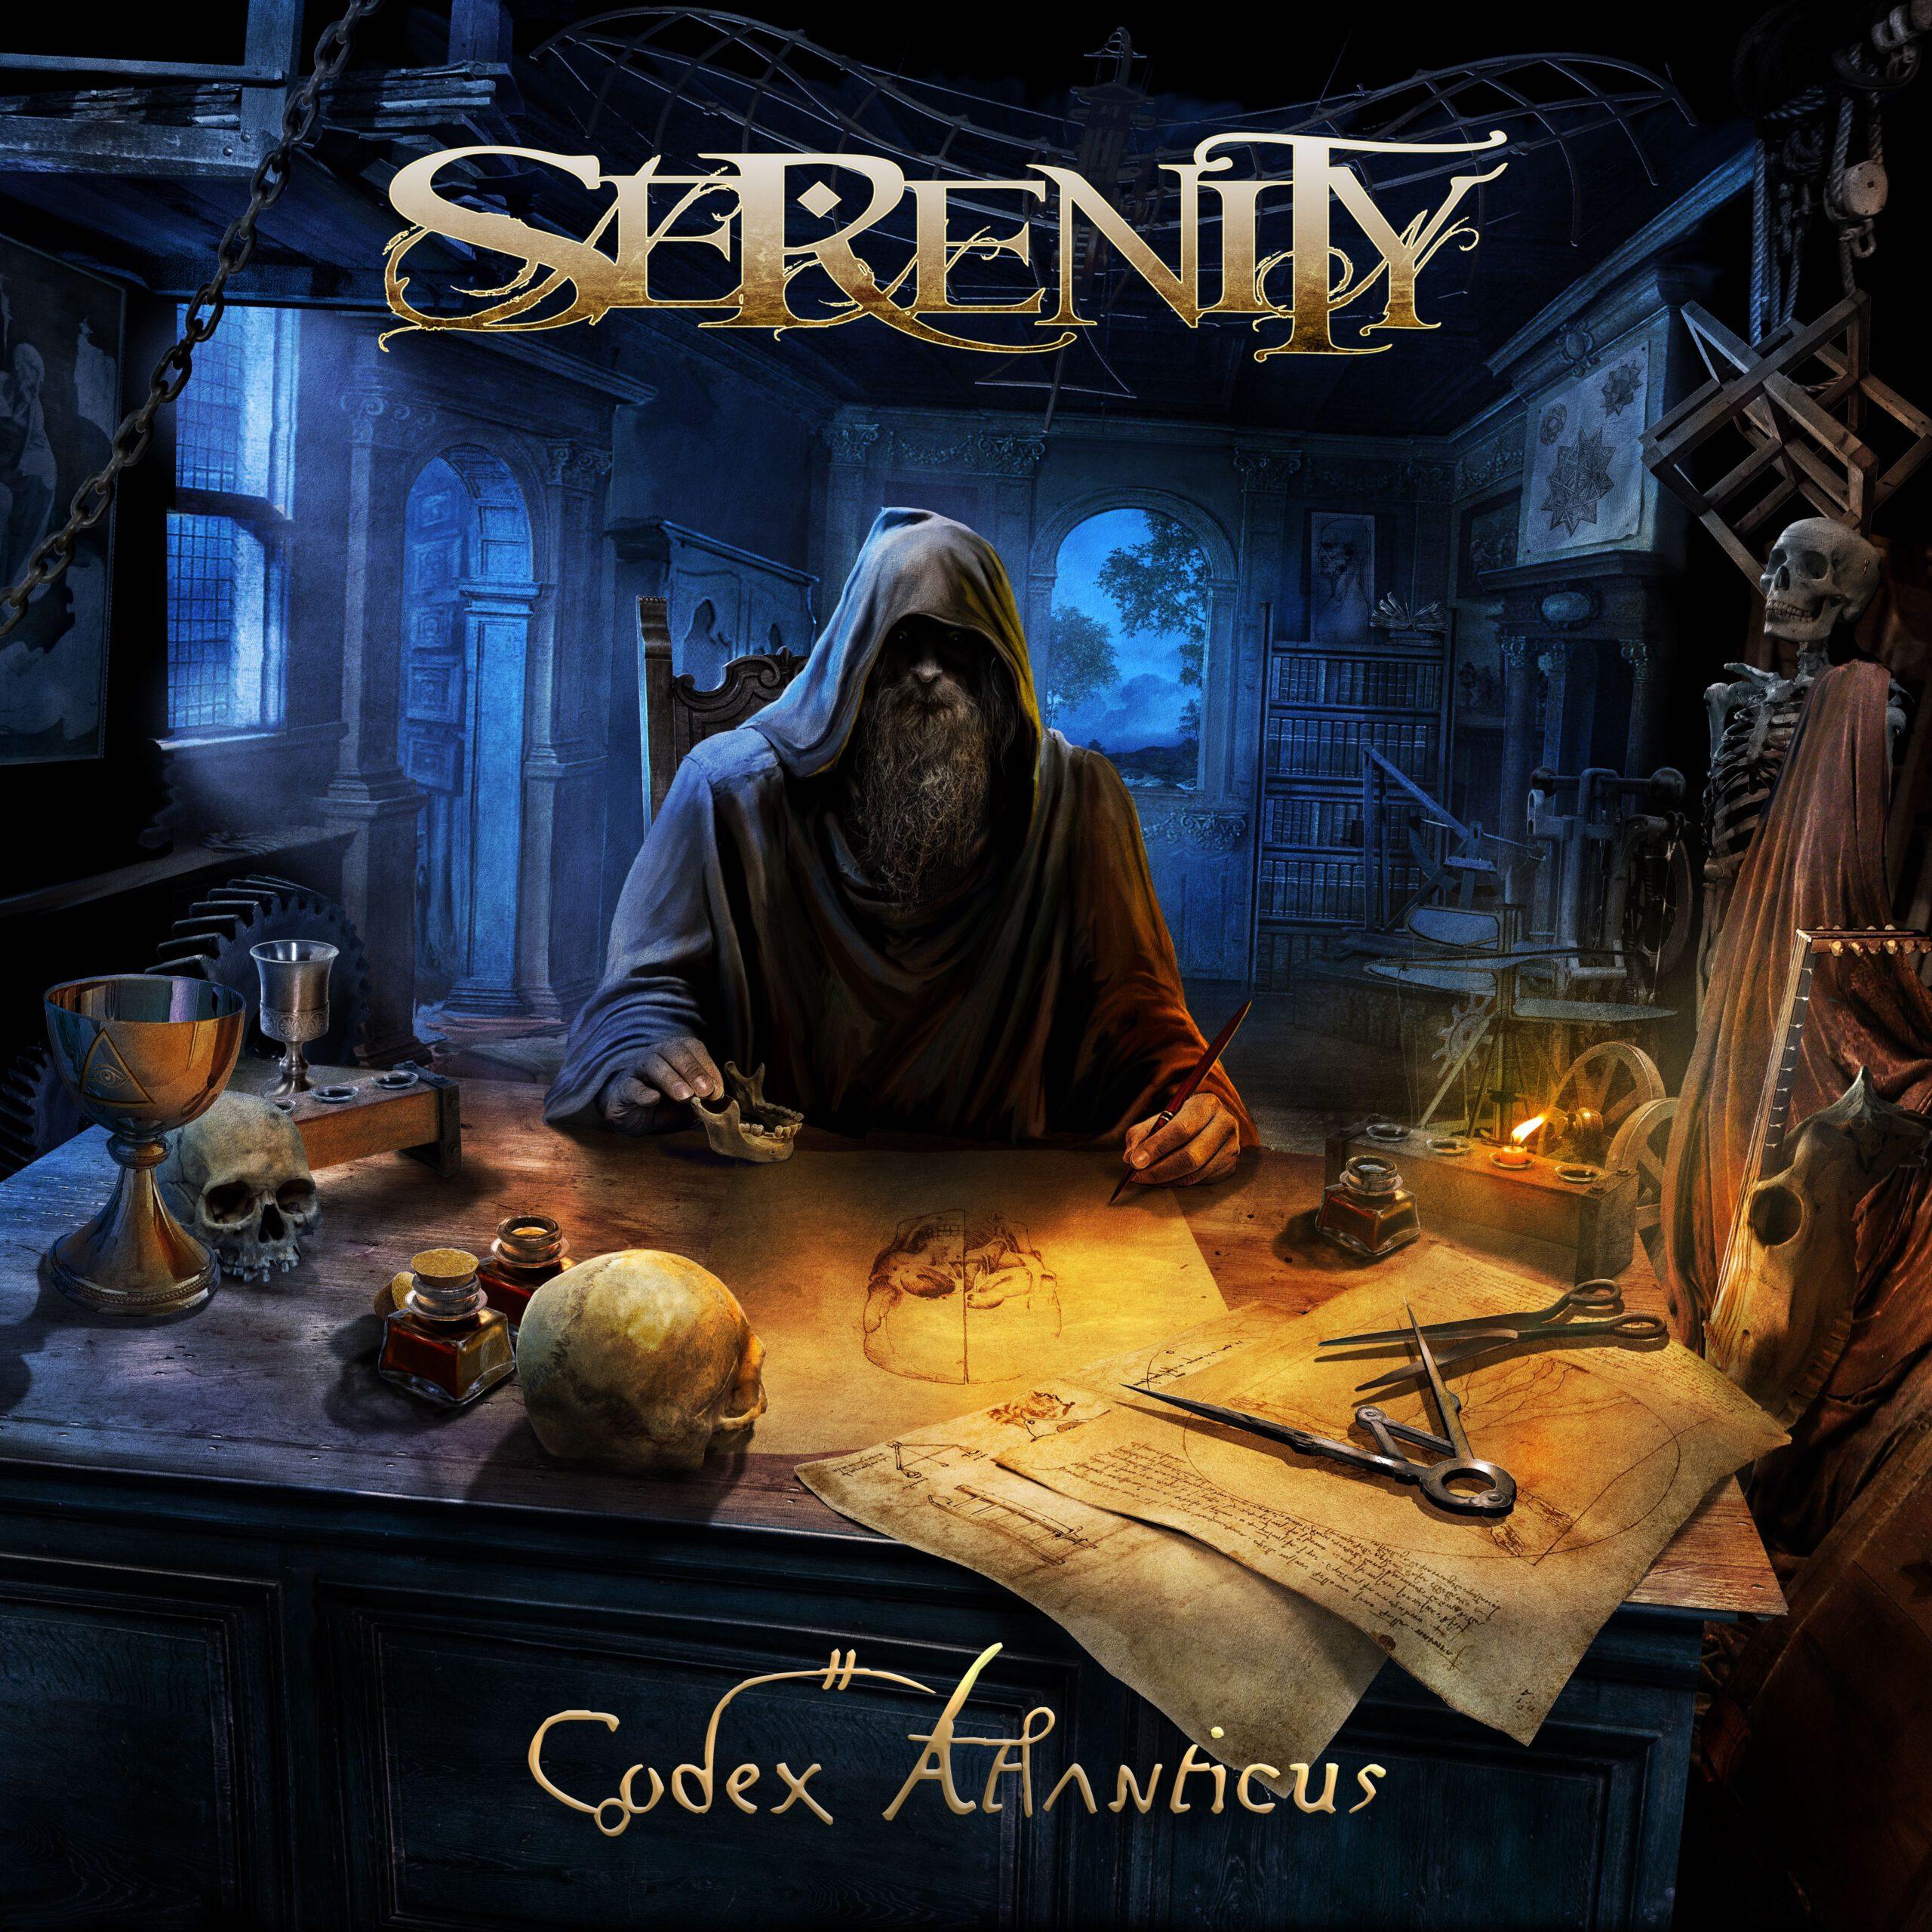 Serenity albumcover2